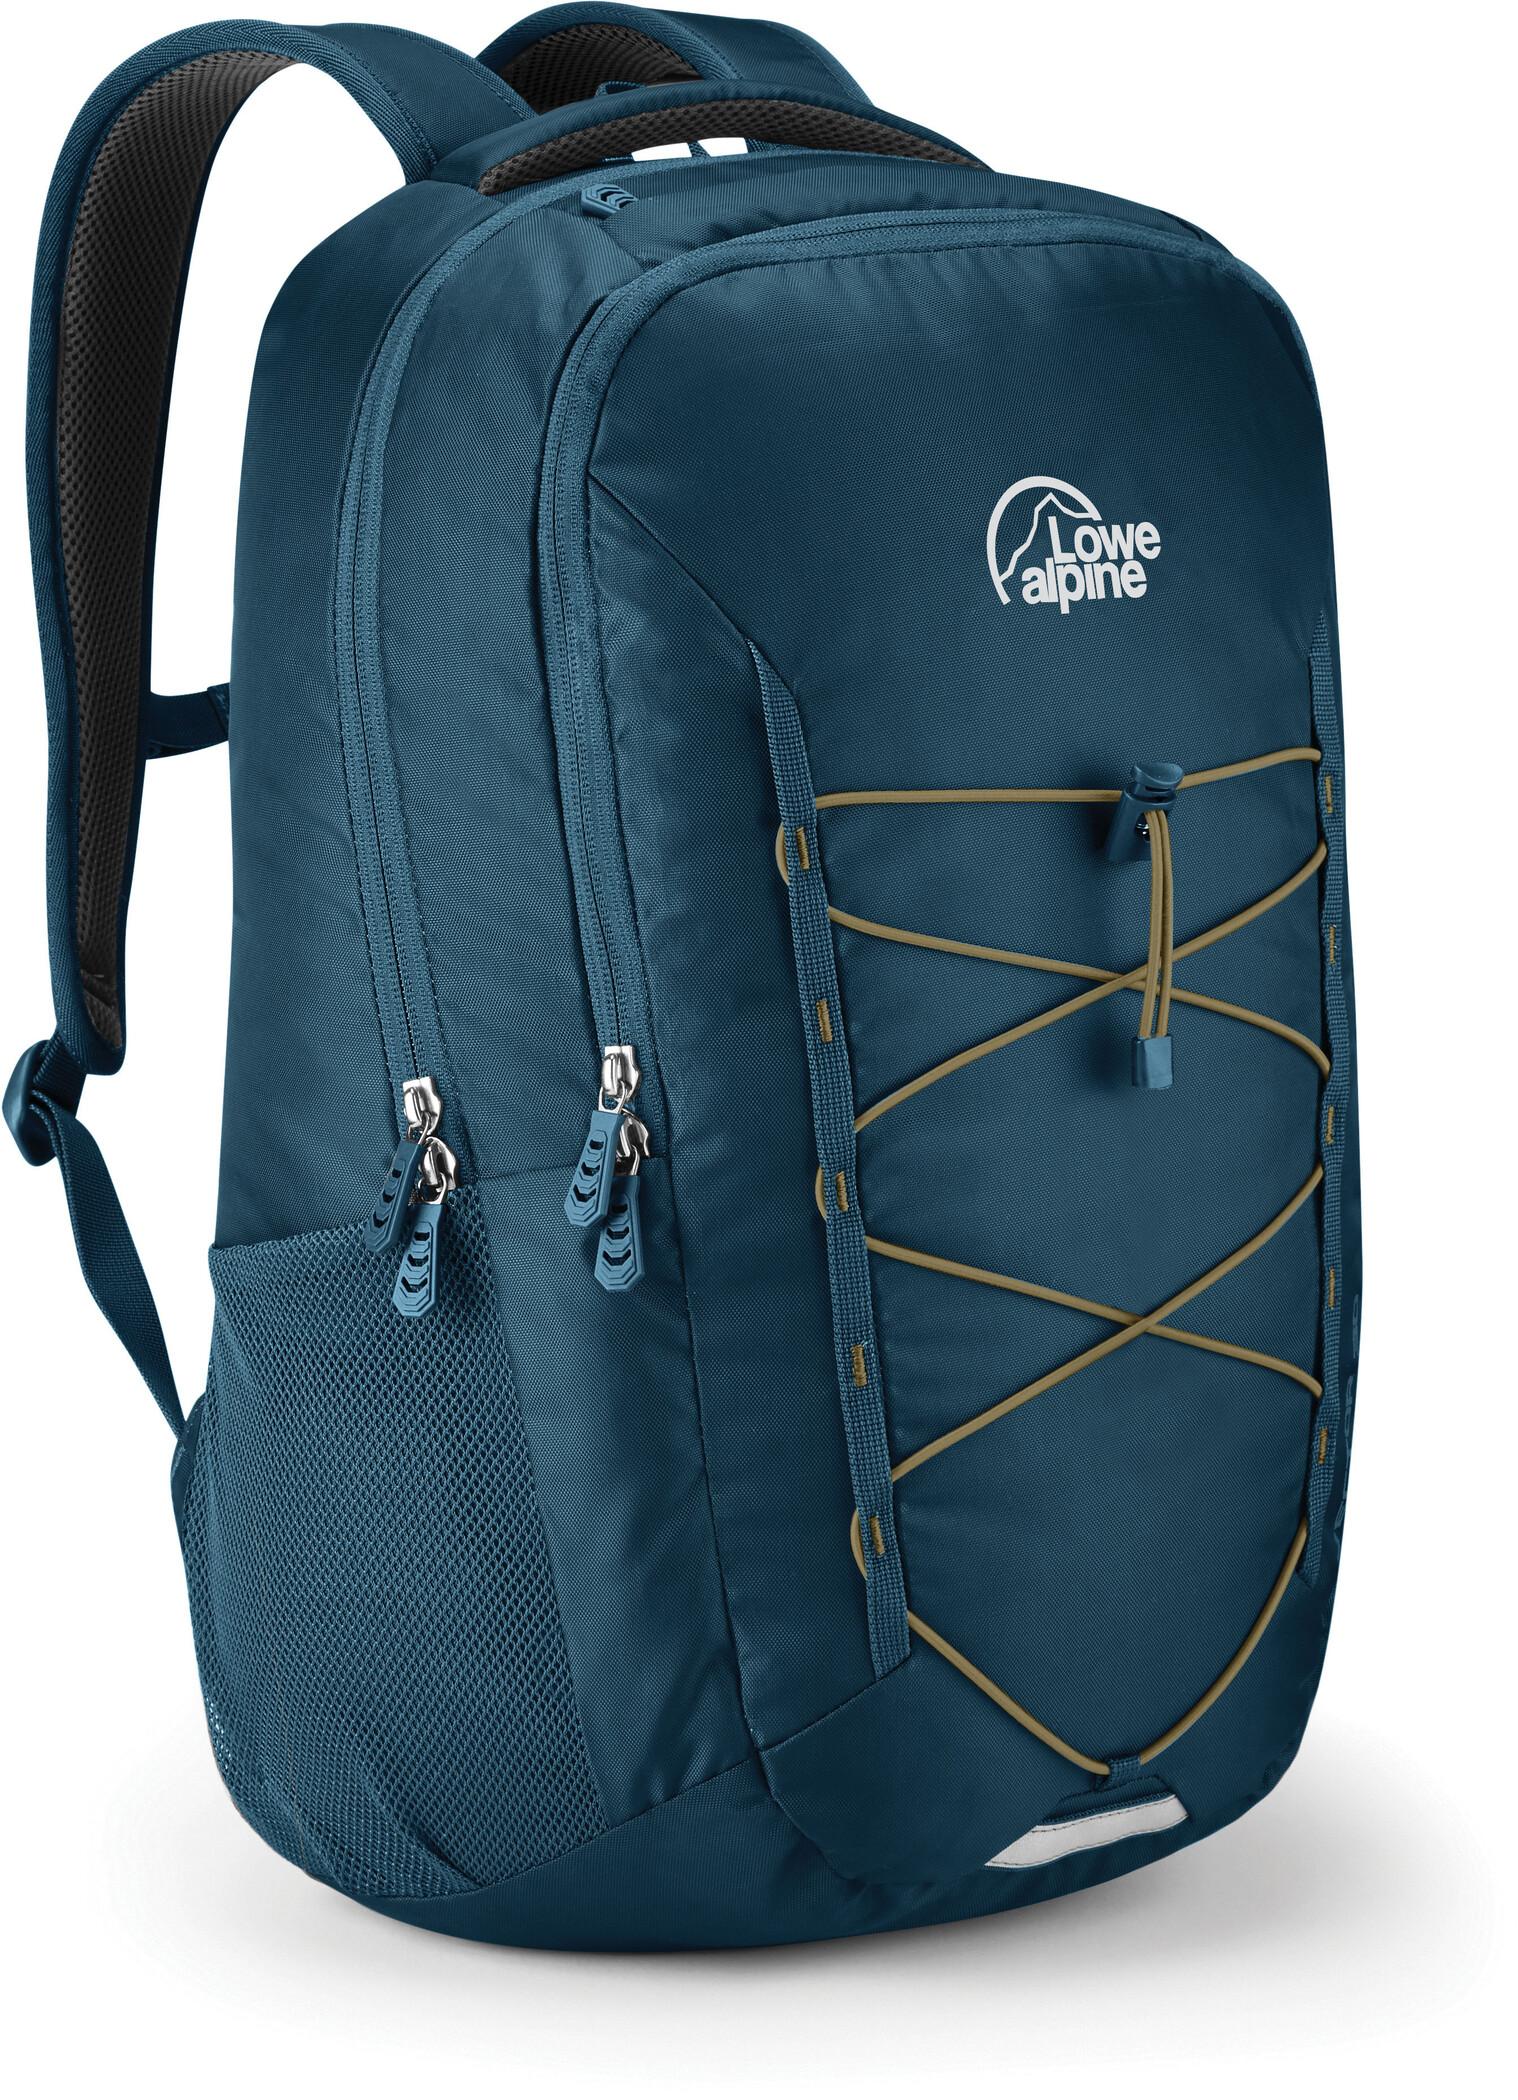 Lowe Alpine Vector 30 Rygsæk Herrer, azure (2019)   Travel bags